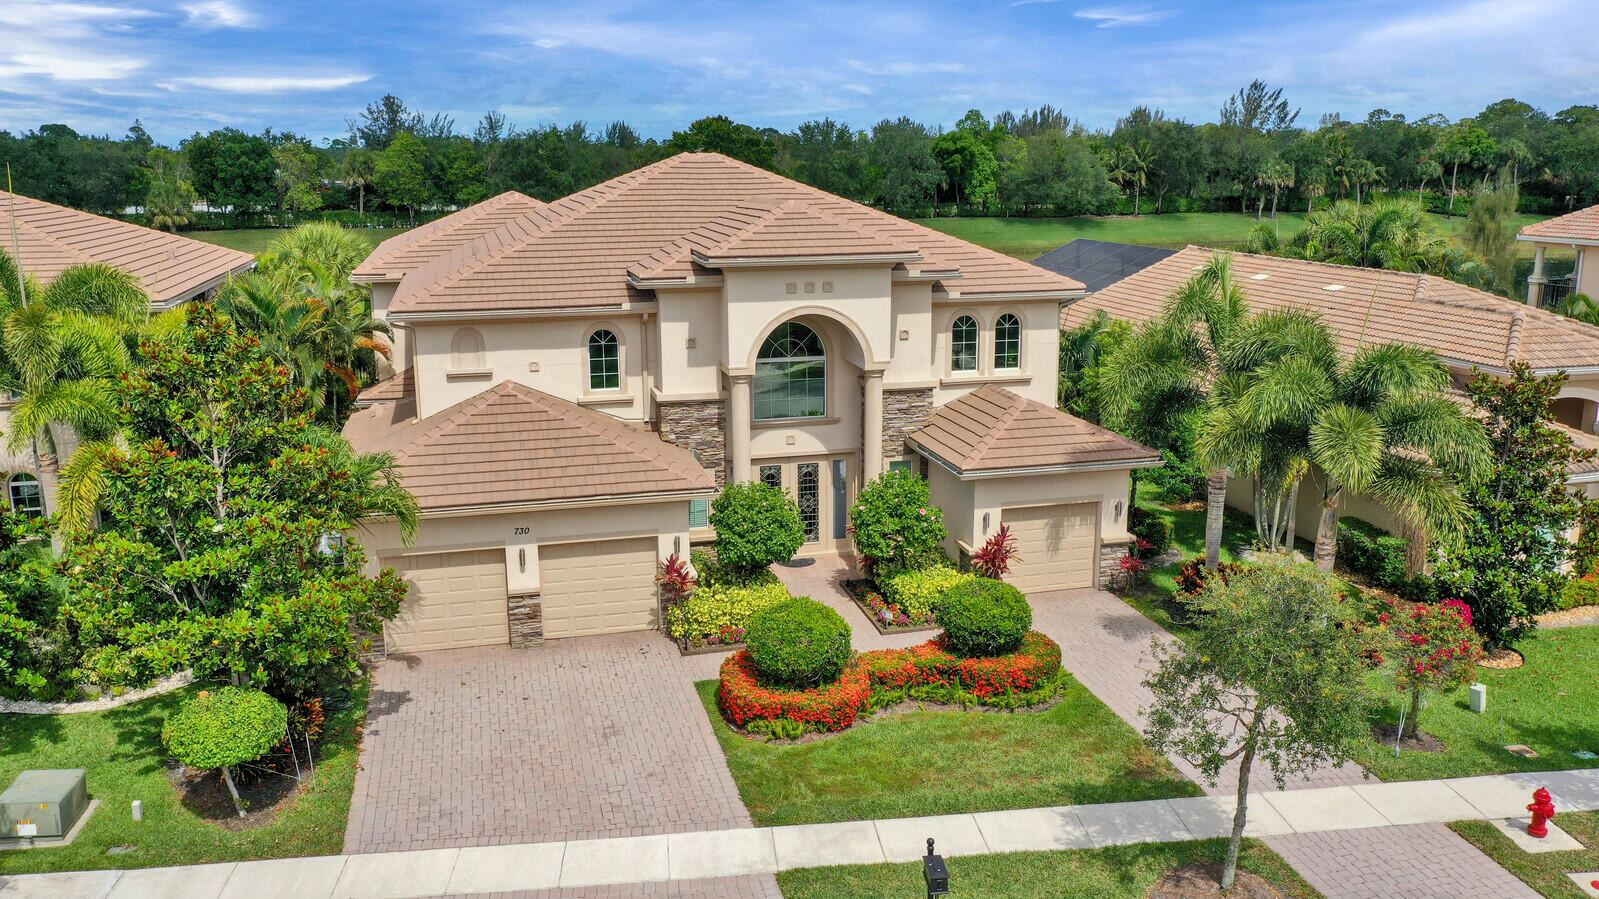 730 Edgebrook Lane, West Palm Beach, FL 33411 - MLS#: RX-10718394